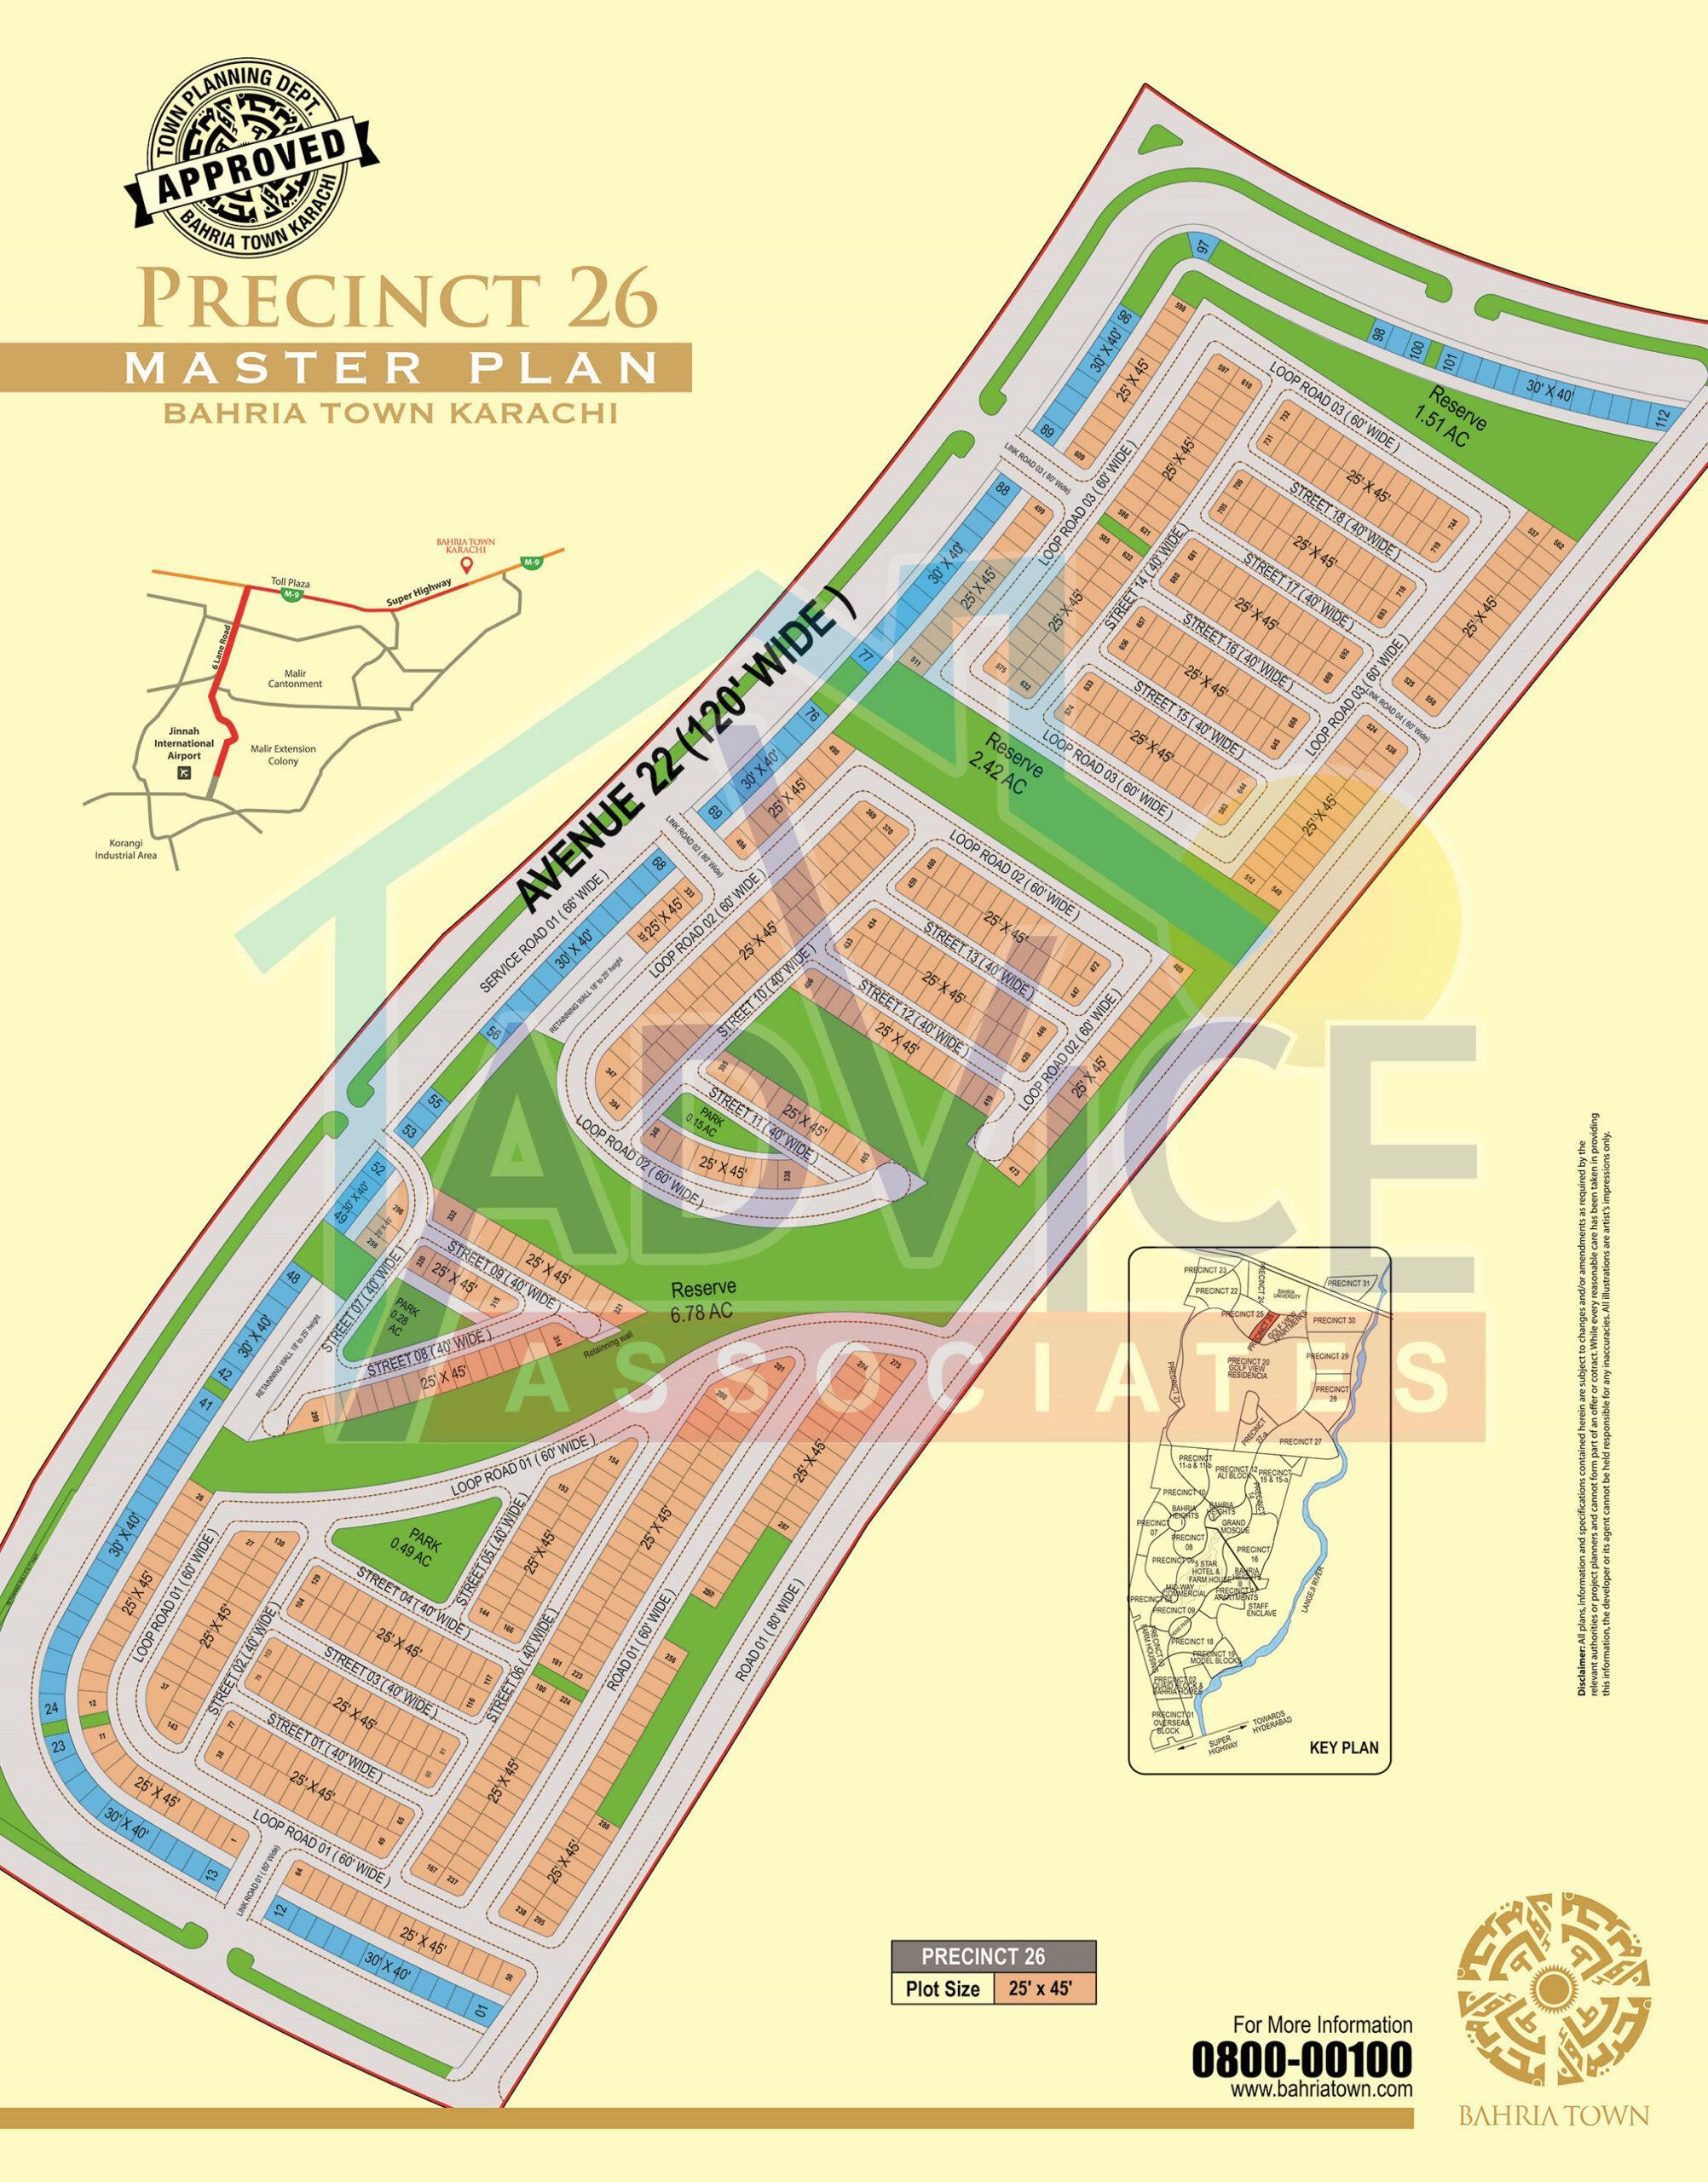 bahria town karachi precinct 26 booking